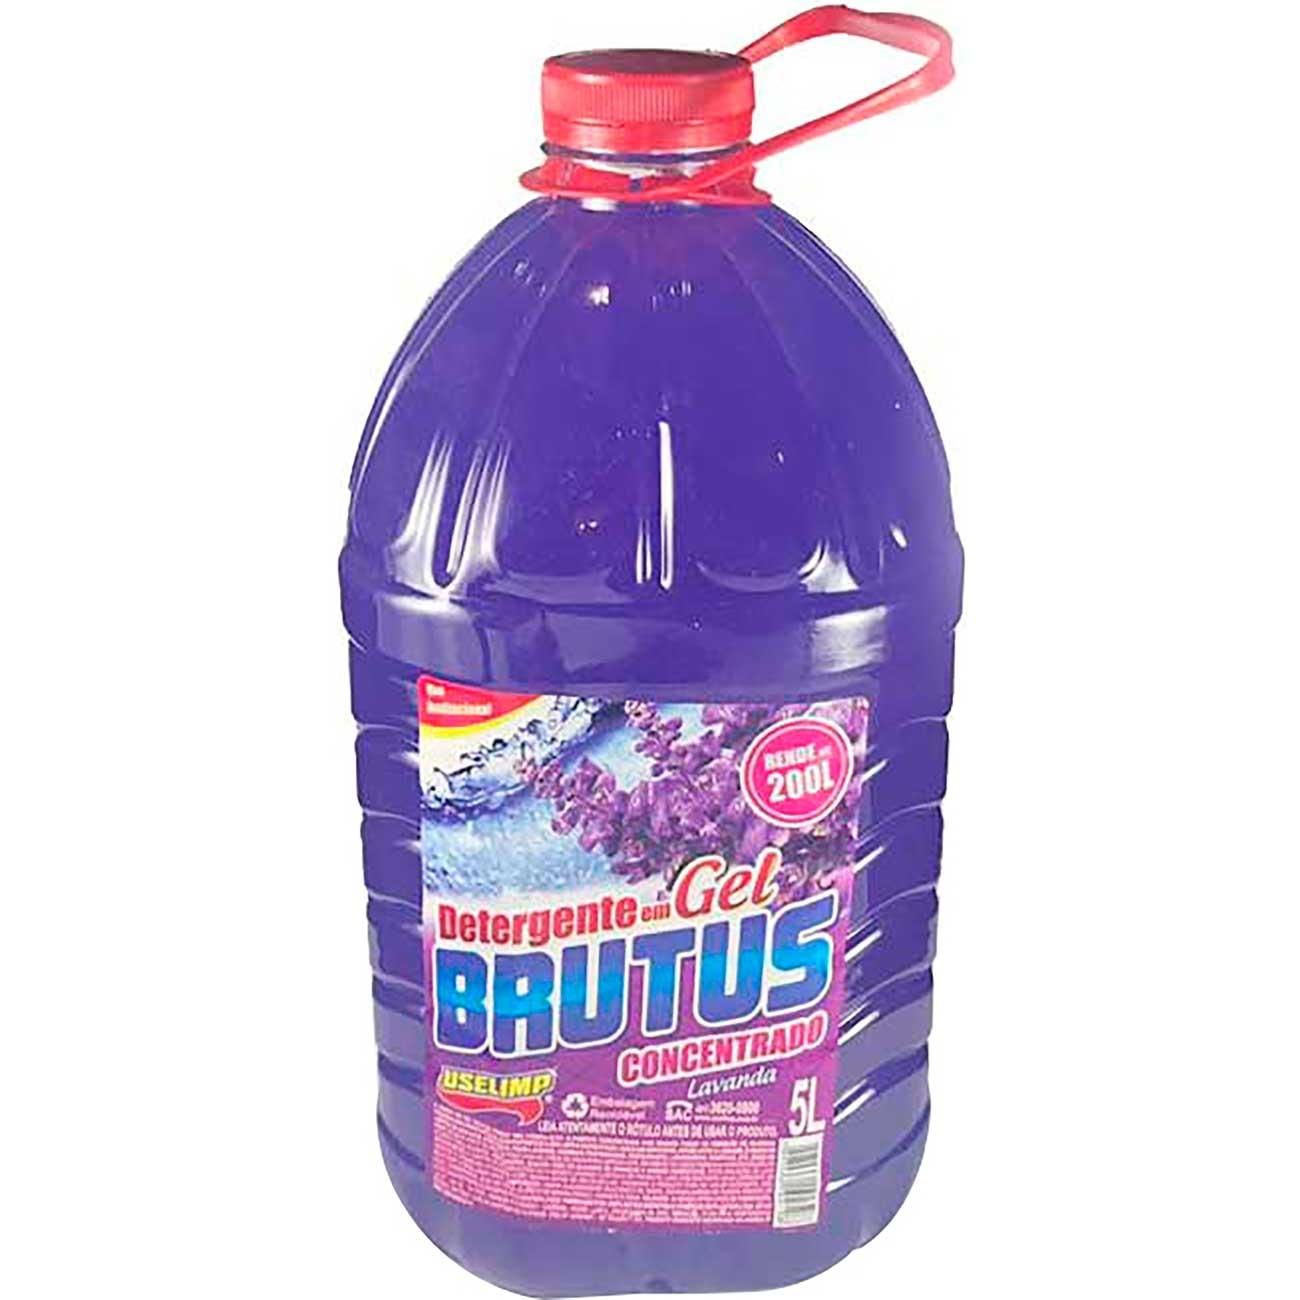 Detergente Concentrado Brutus Em Gel Lavanda 5L